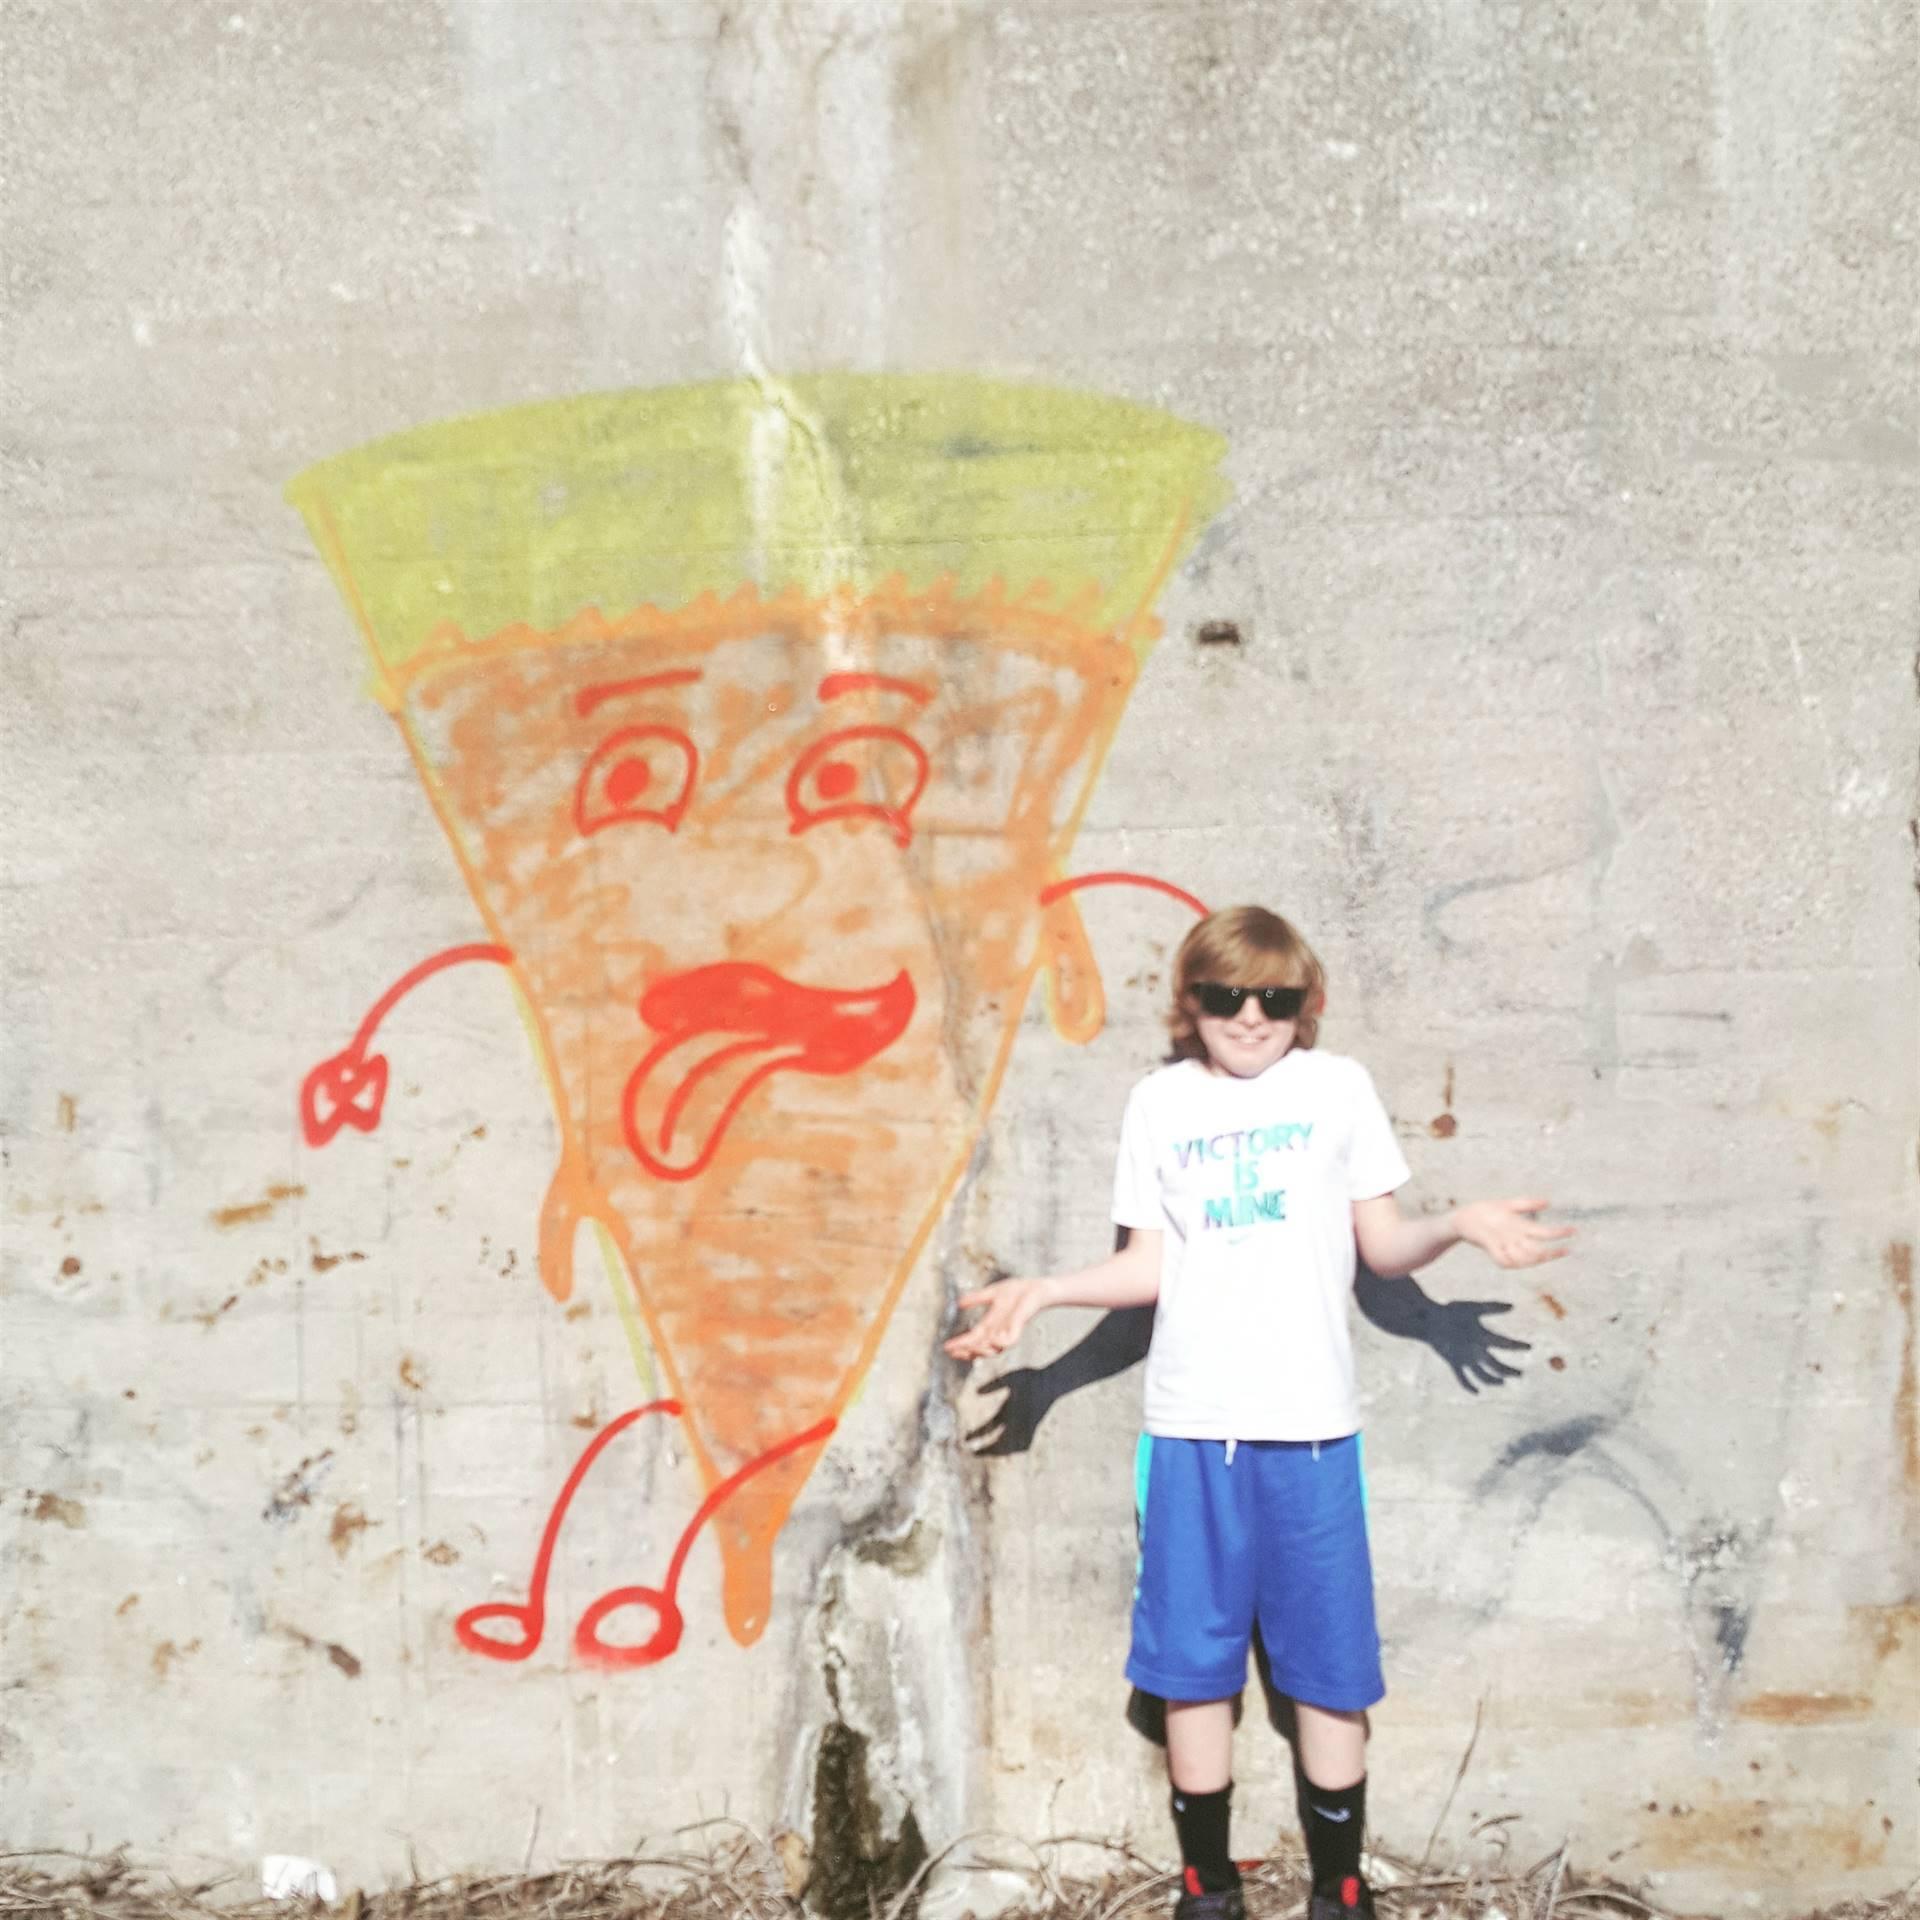 Max B Instagramming Street Art @maxbraschwitz